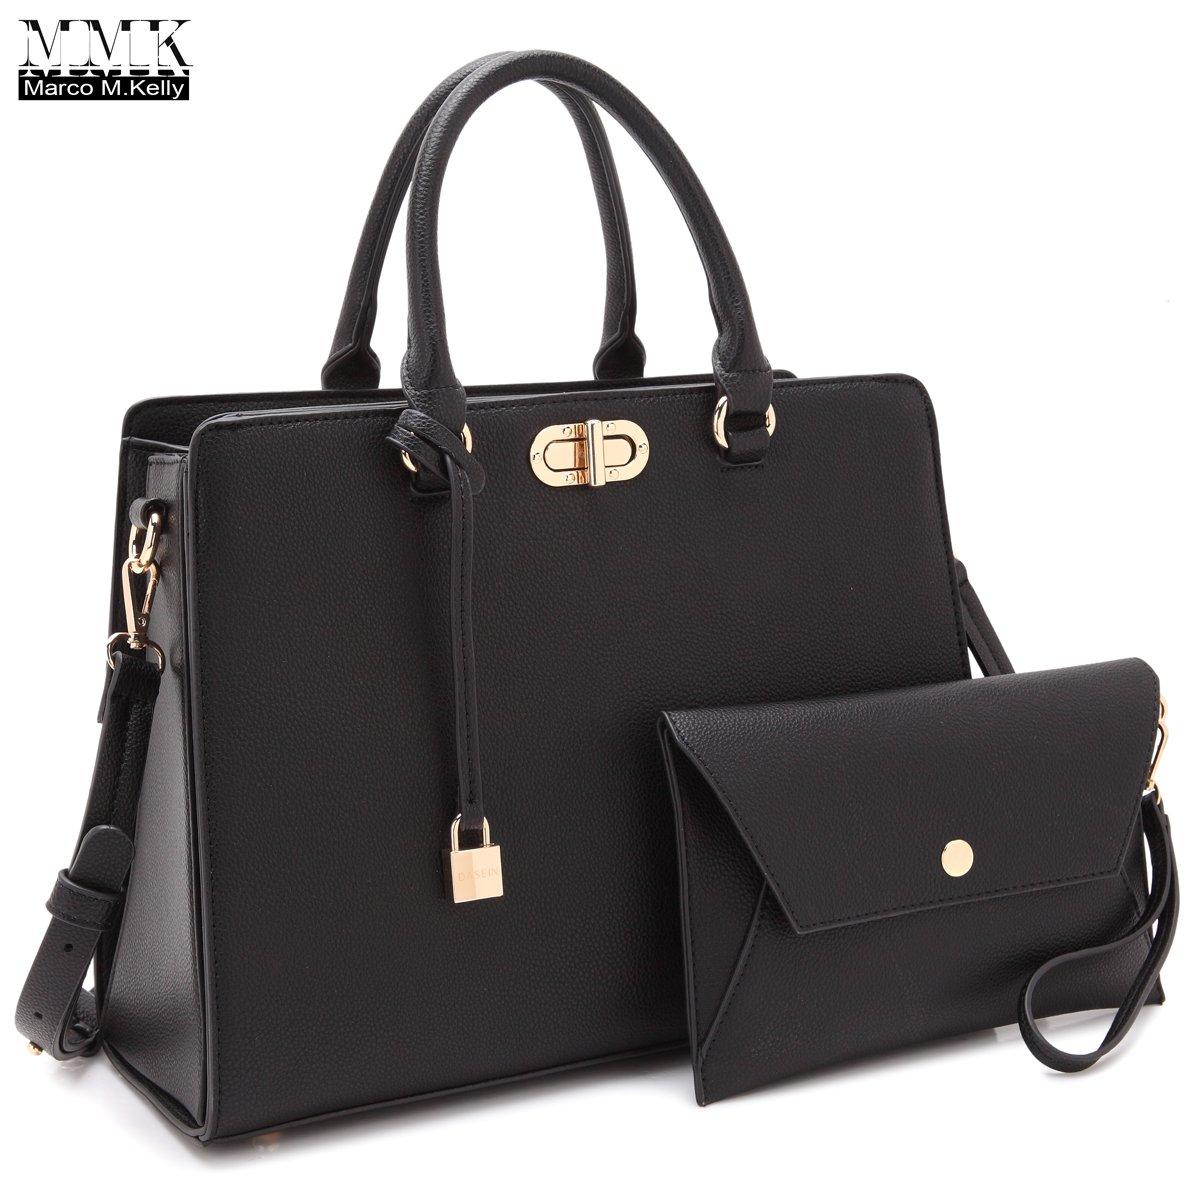 MMK collection Fashion Handbag with coin purse(XL-11) Classic Women Purse Handbag for Women` Signature fashion Designer Purse ~ Perfect Women Satchel Purse (XL-23-7581-BK)